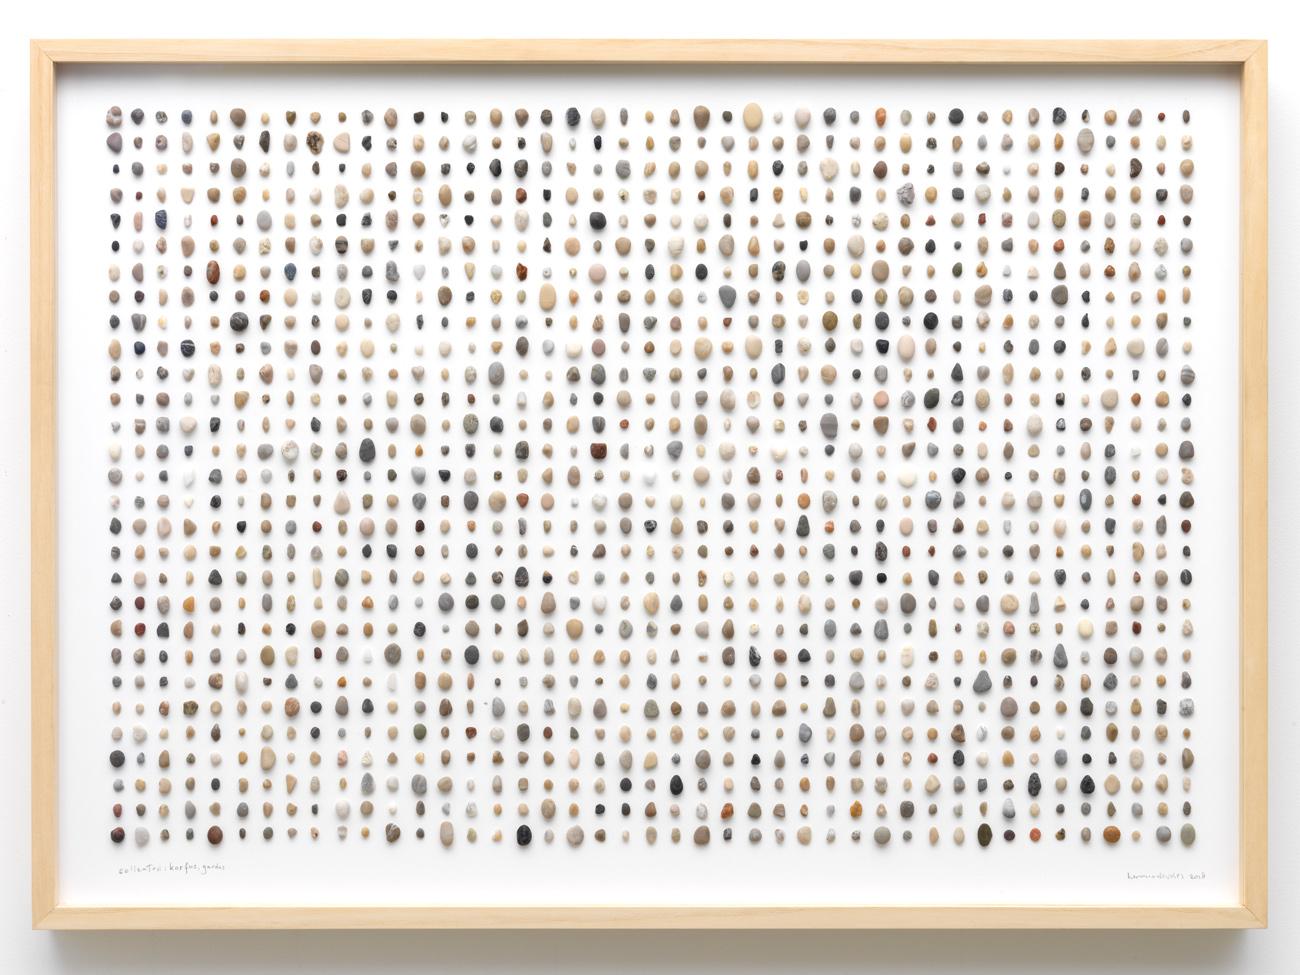 herman de vries, untitled: gavdos, 2018